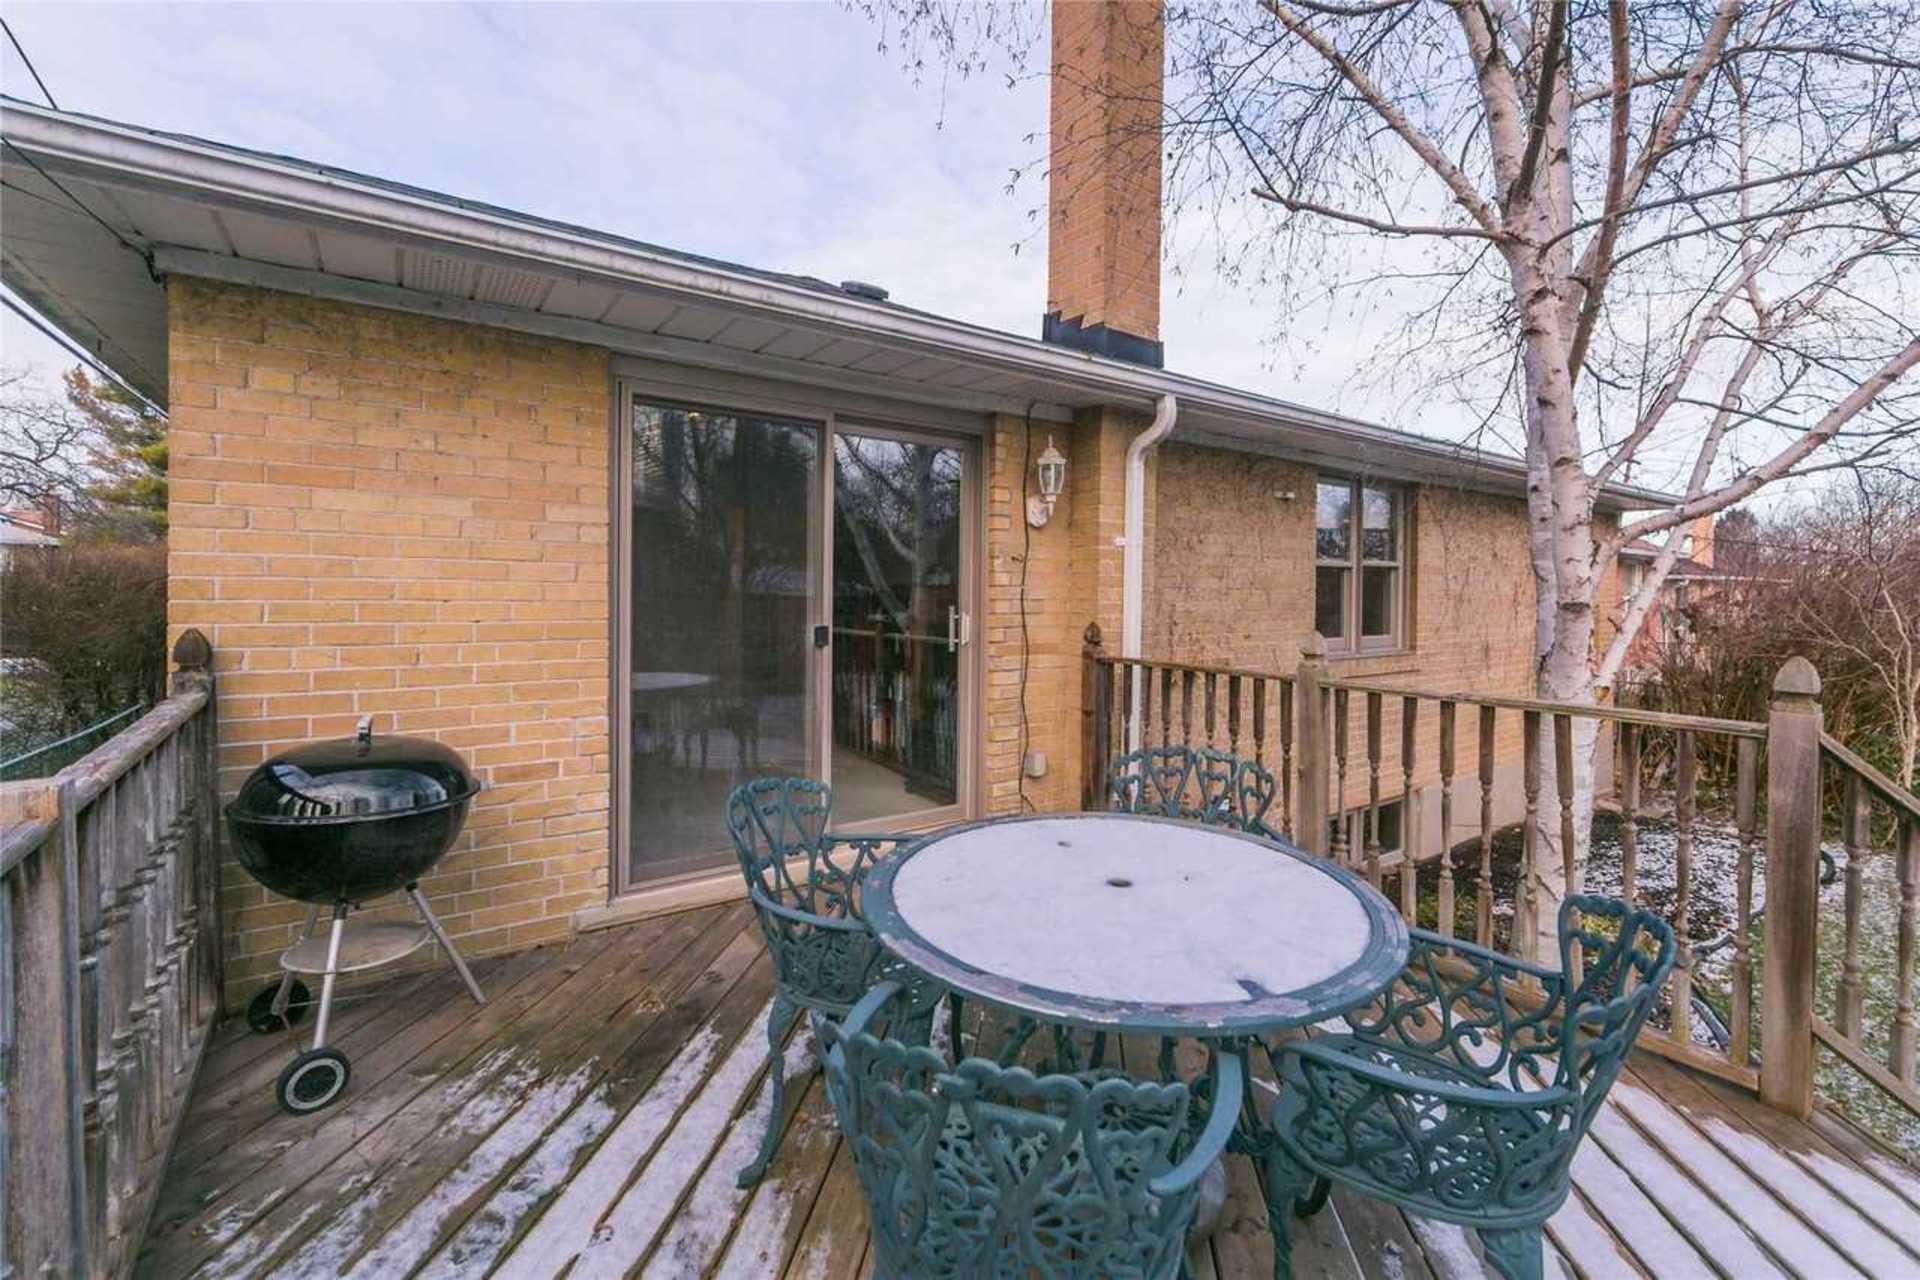 23-arrowstook-rd-bayview-village-toronto-18 at SALE #473 - 23 Arrowstook Road, Bayview Village, Toronto